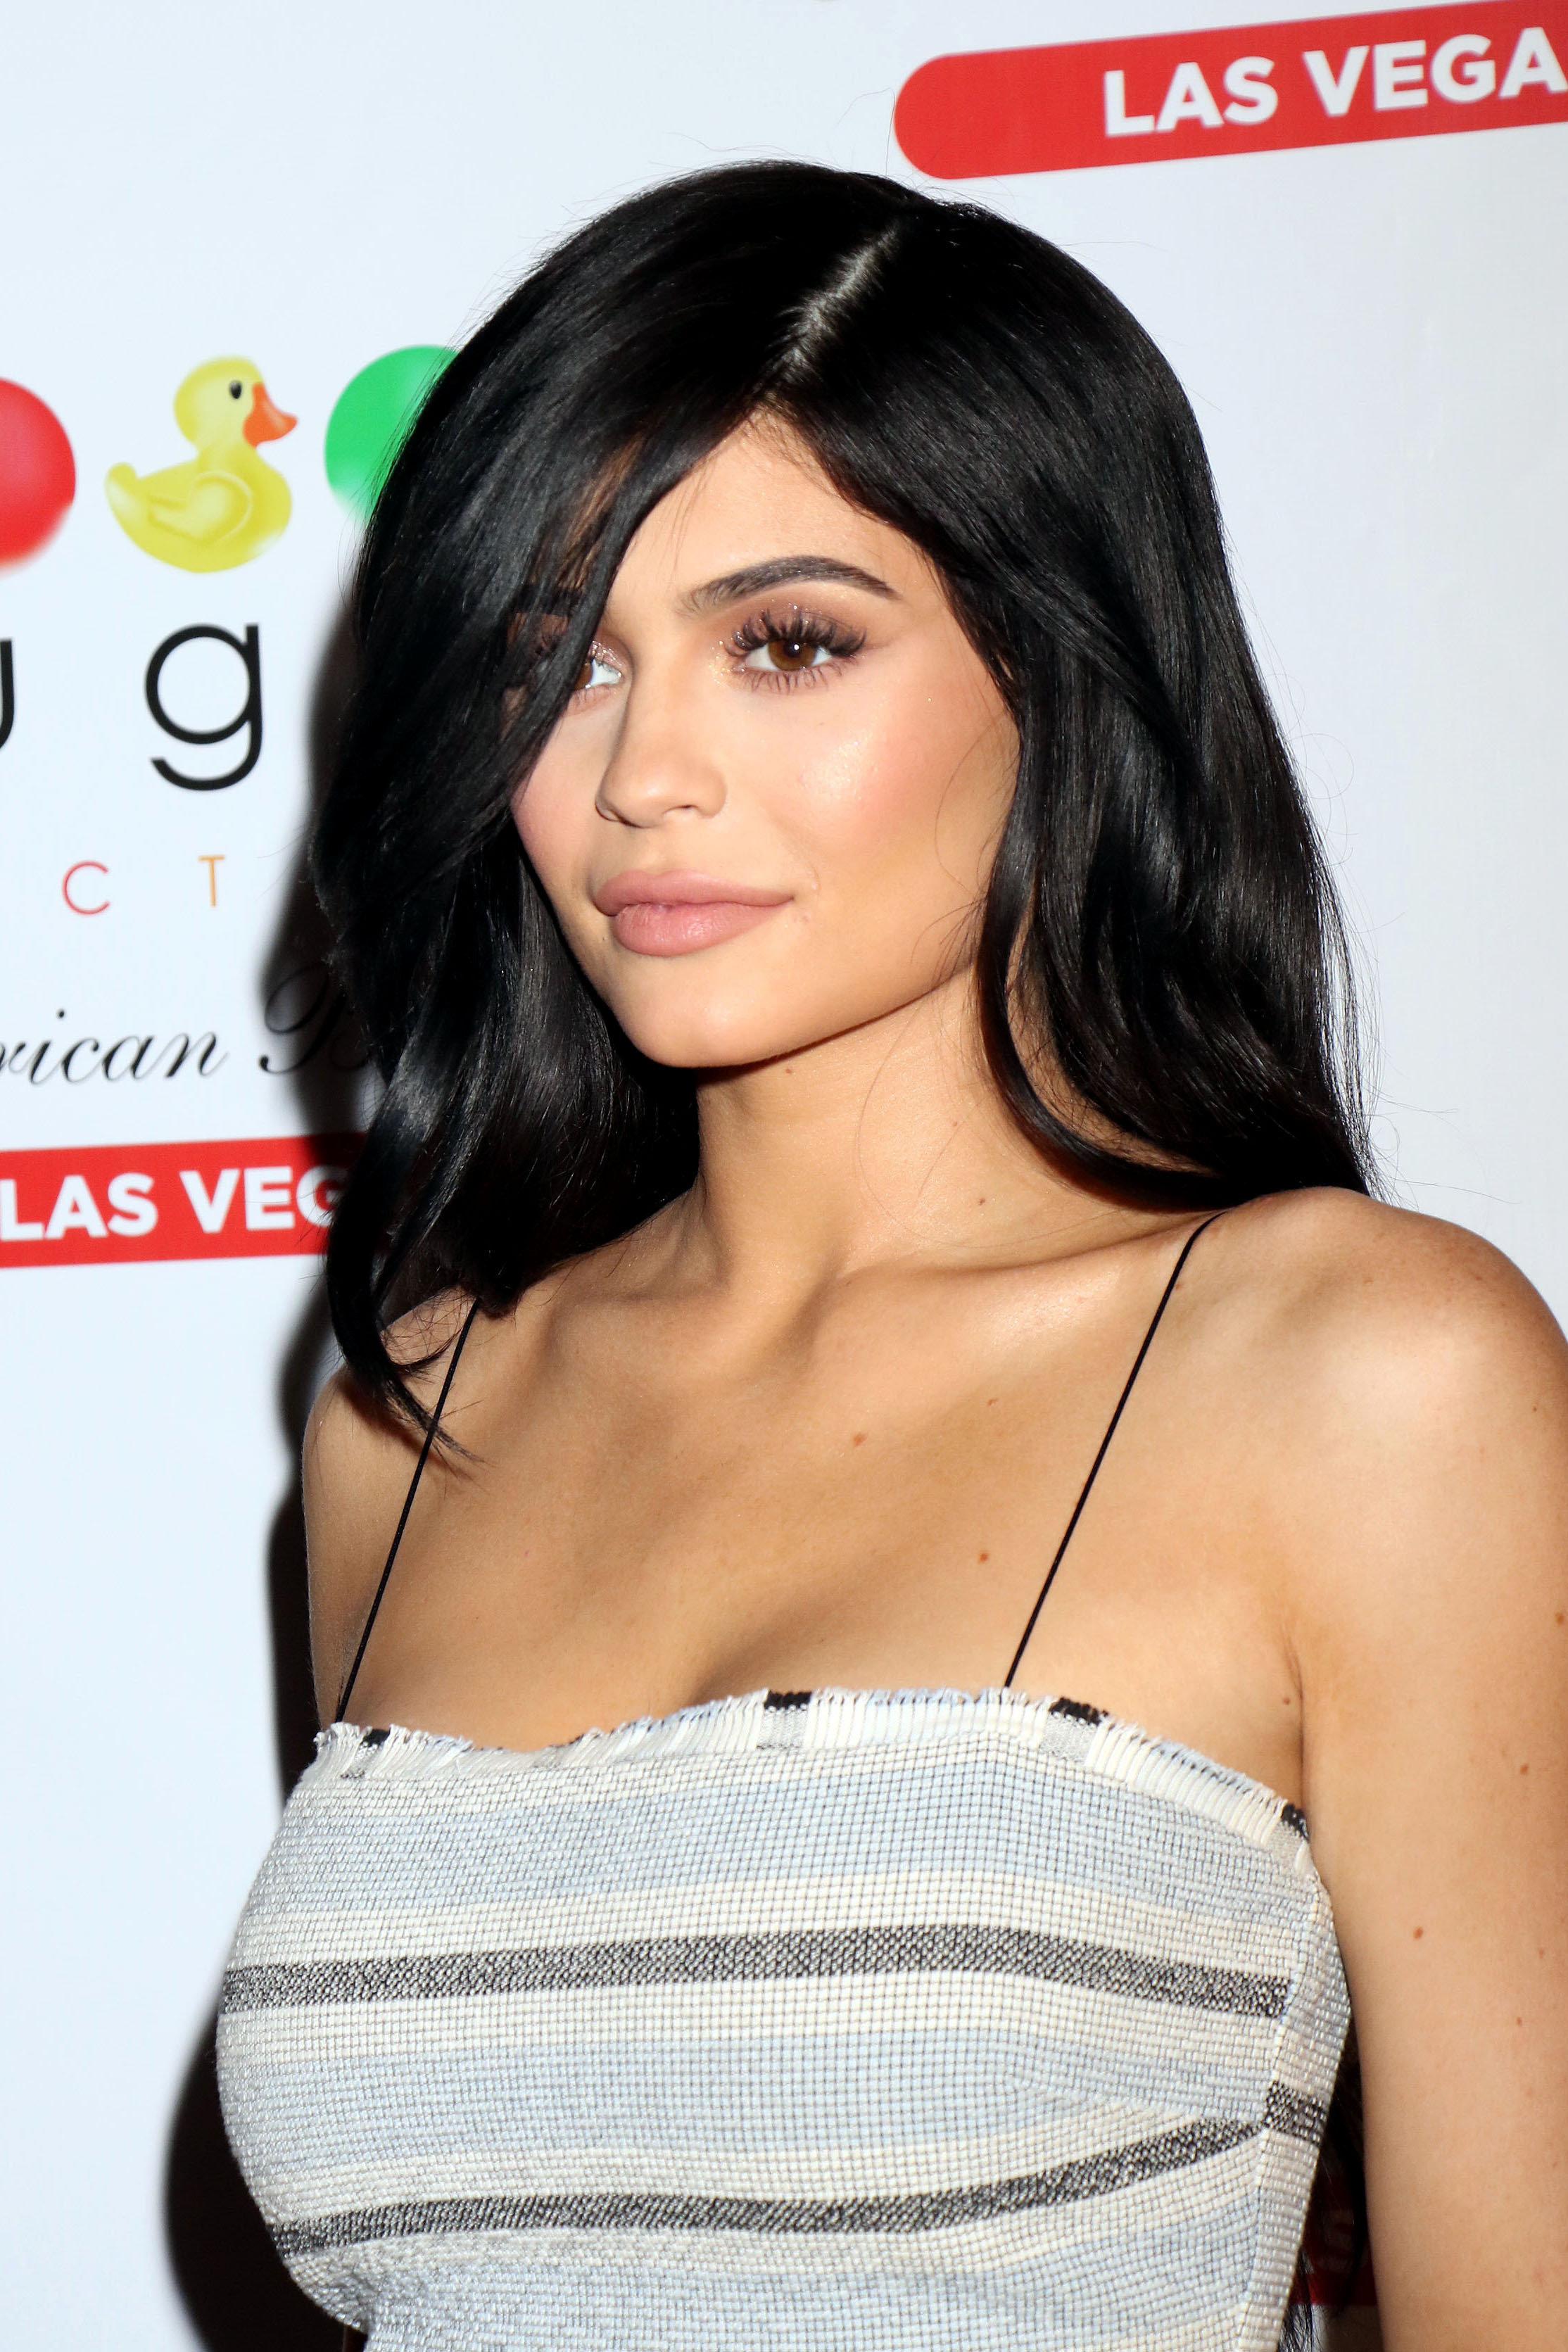 Snapchat's Value Drops $1.3 Billion After 1 Kylie Jenner